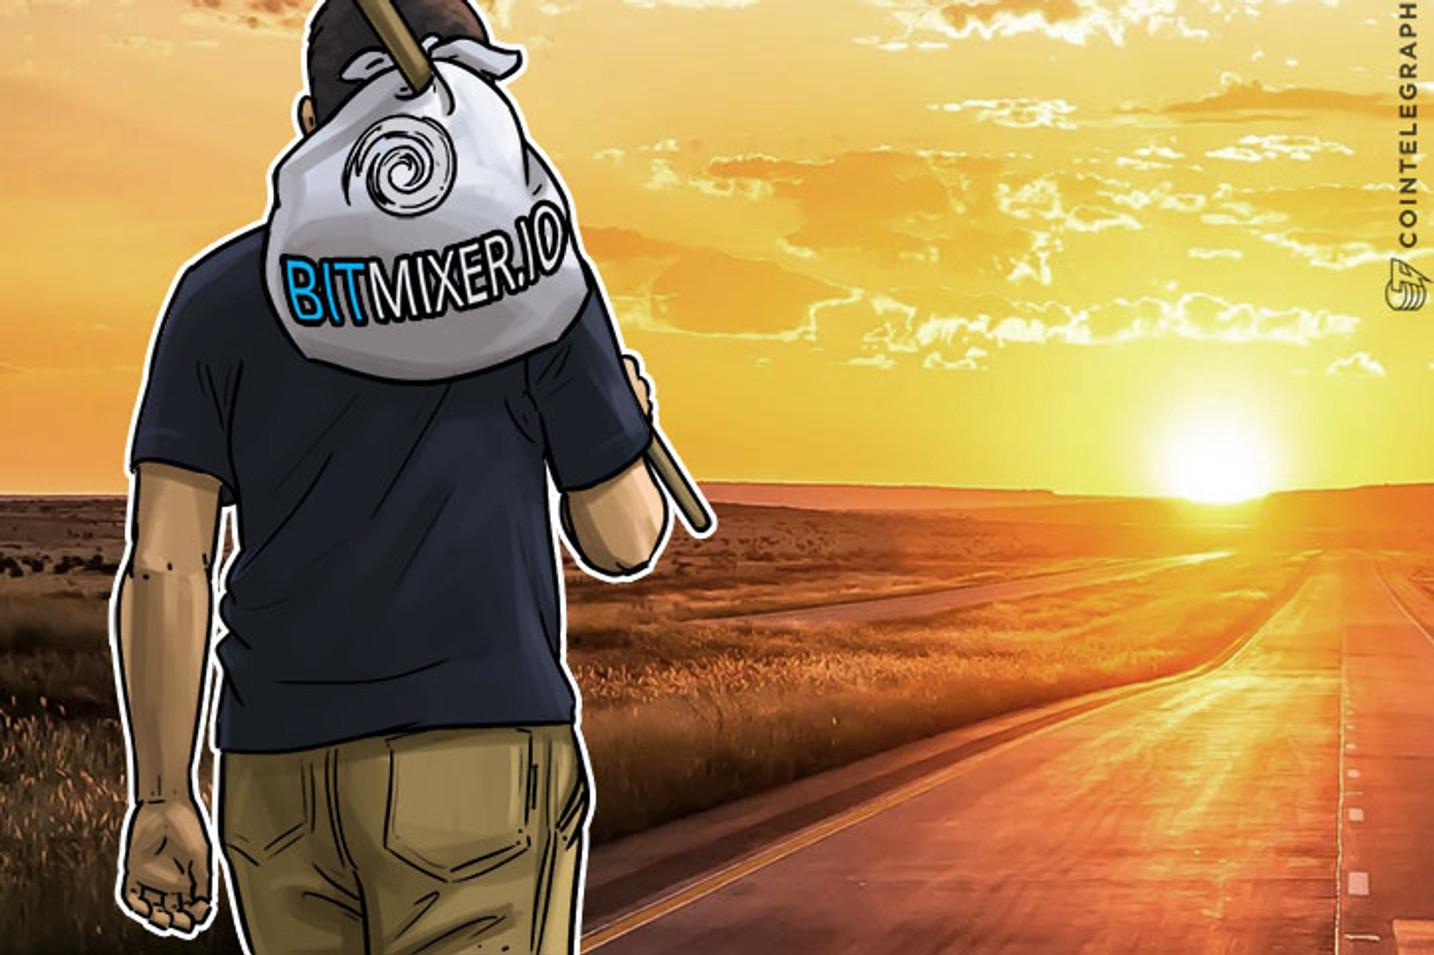 World's Largest Bitcoin Tumbling Service Announces Sudden Shutdown